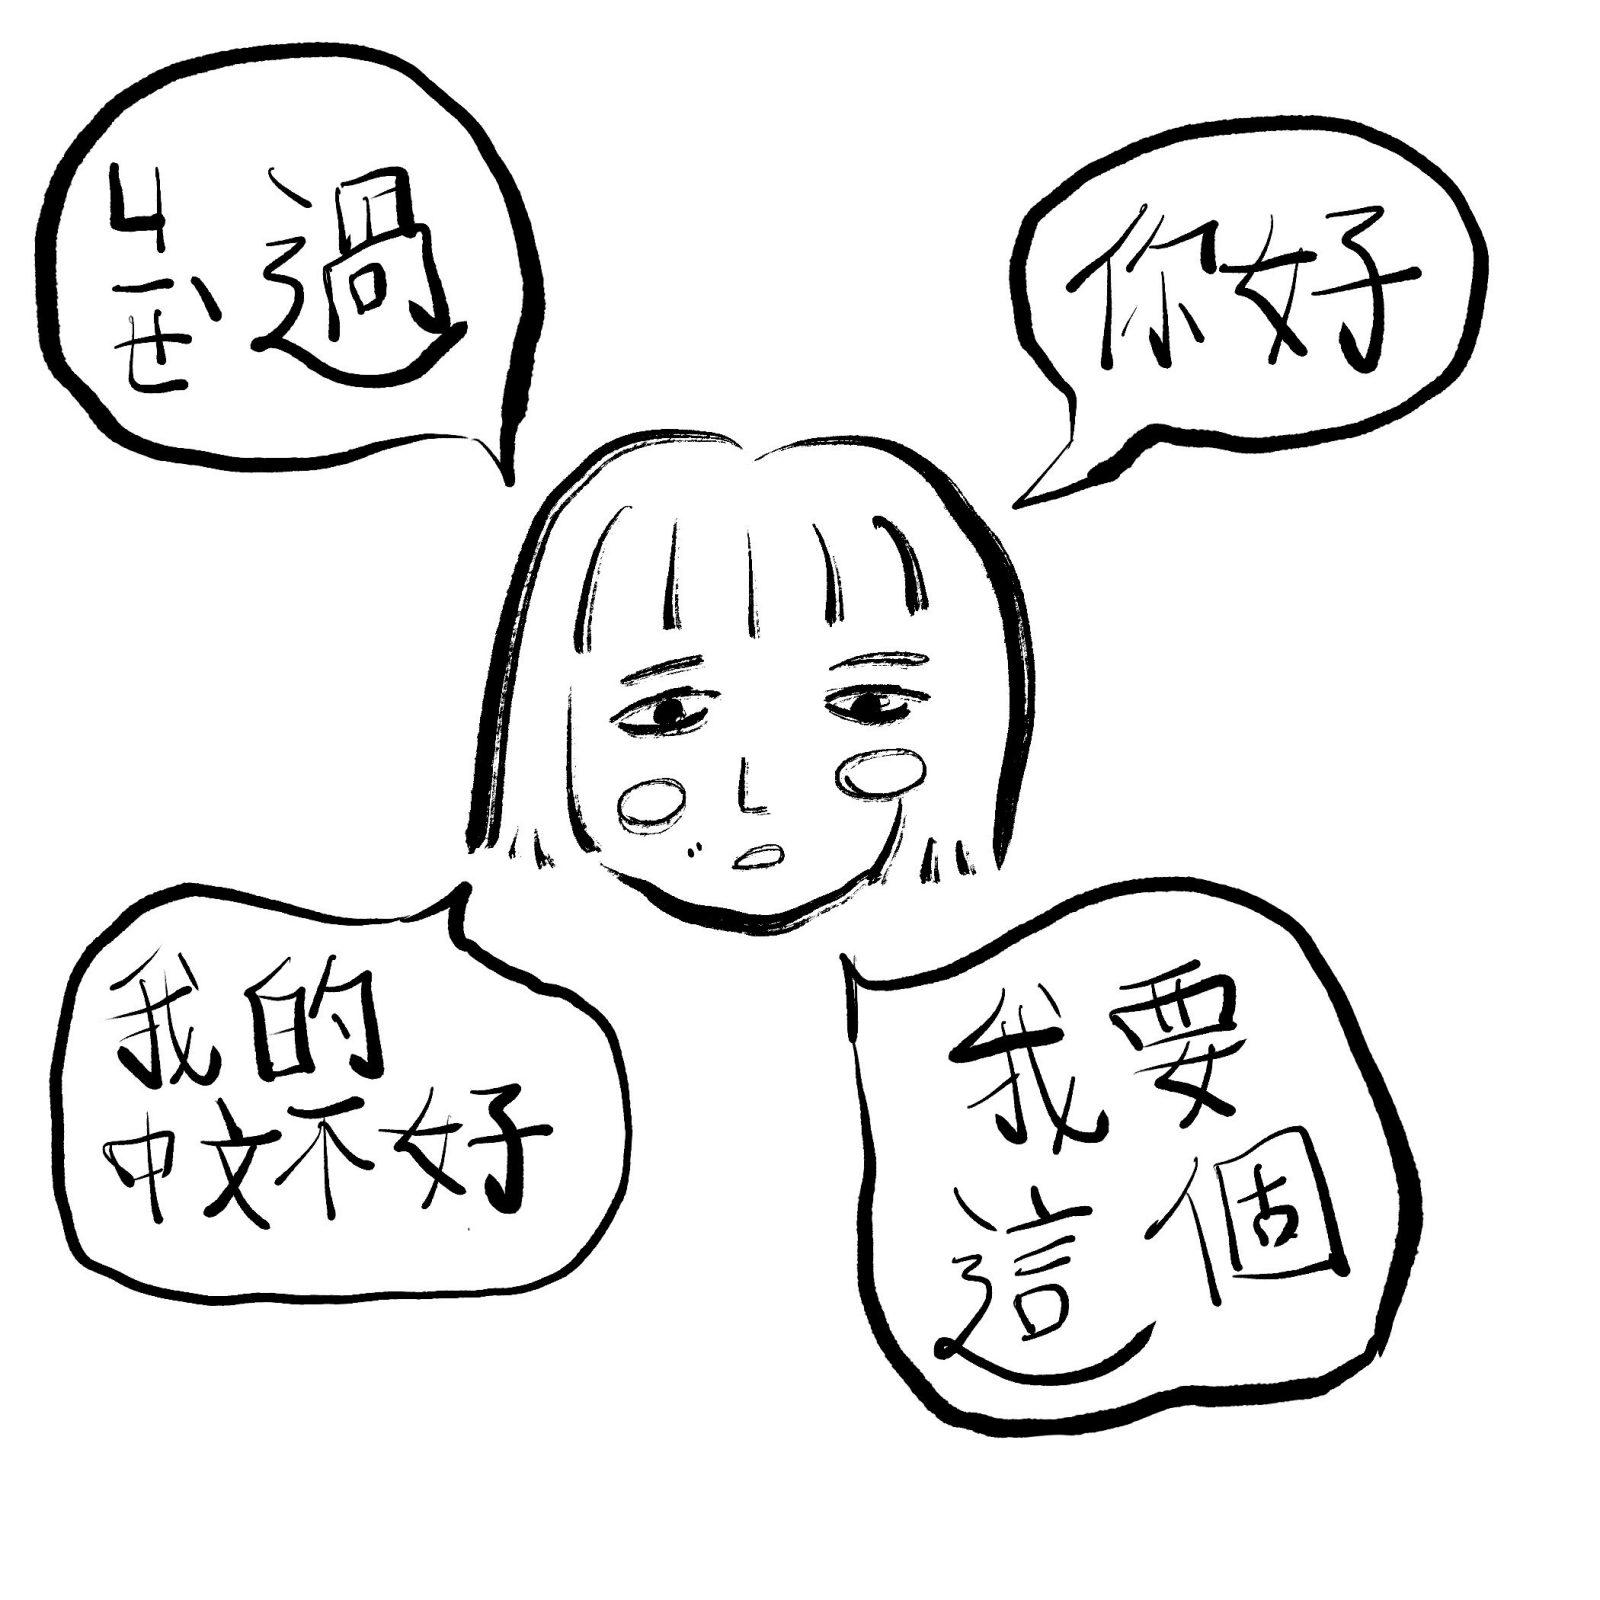 Illustrated character with broken mandarin speech bubbles